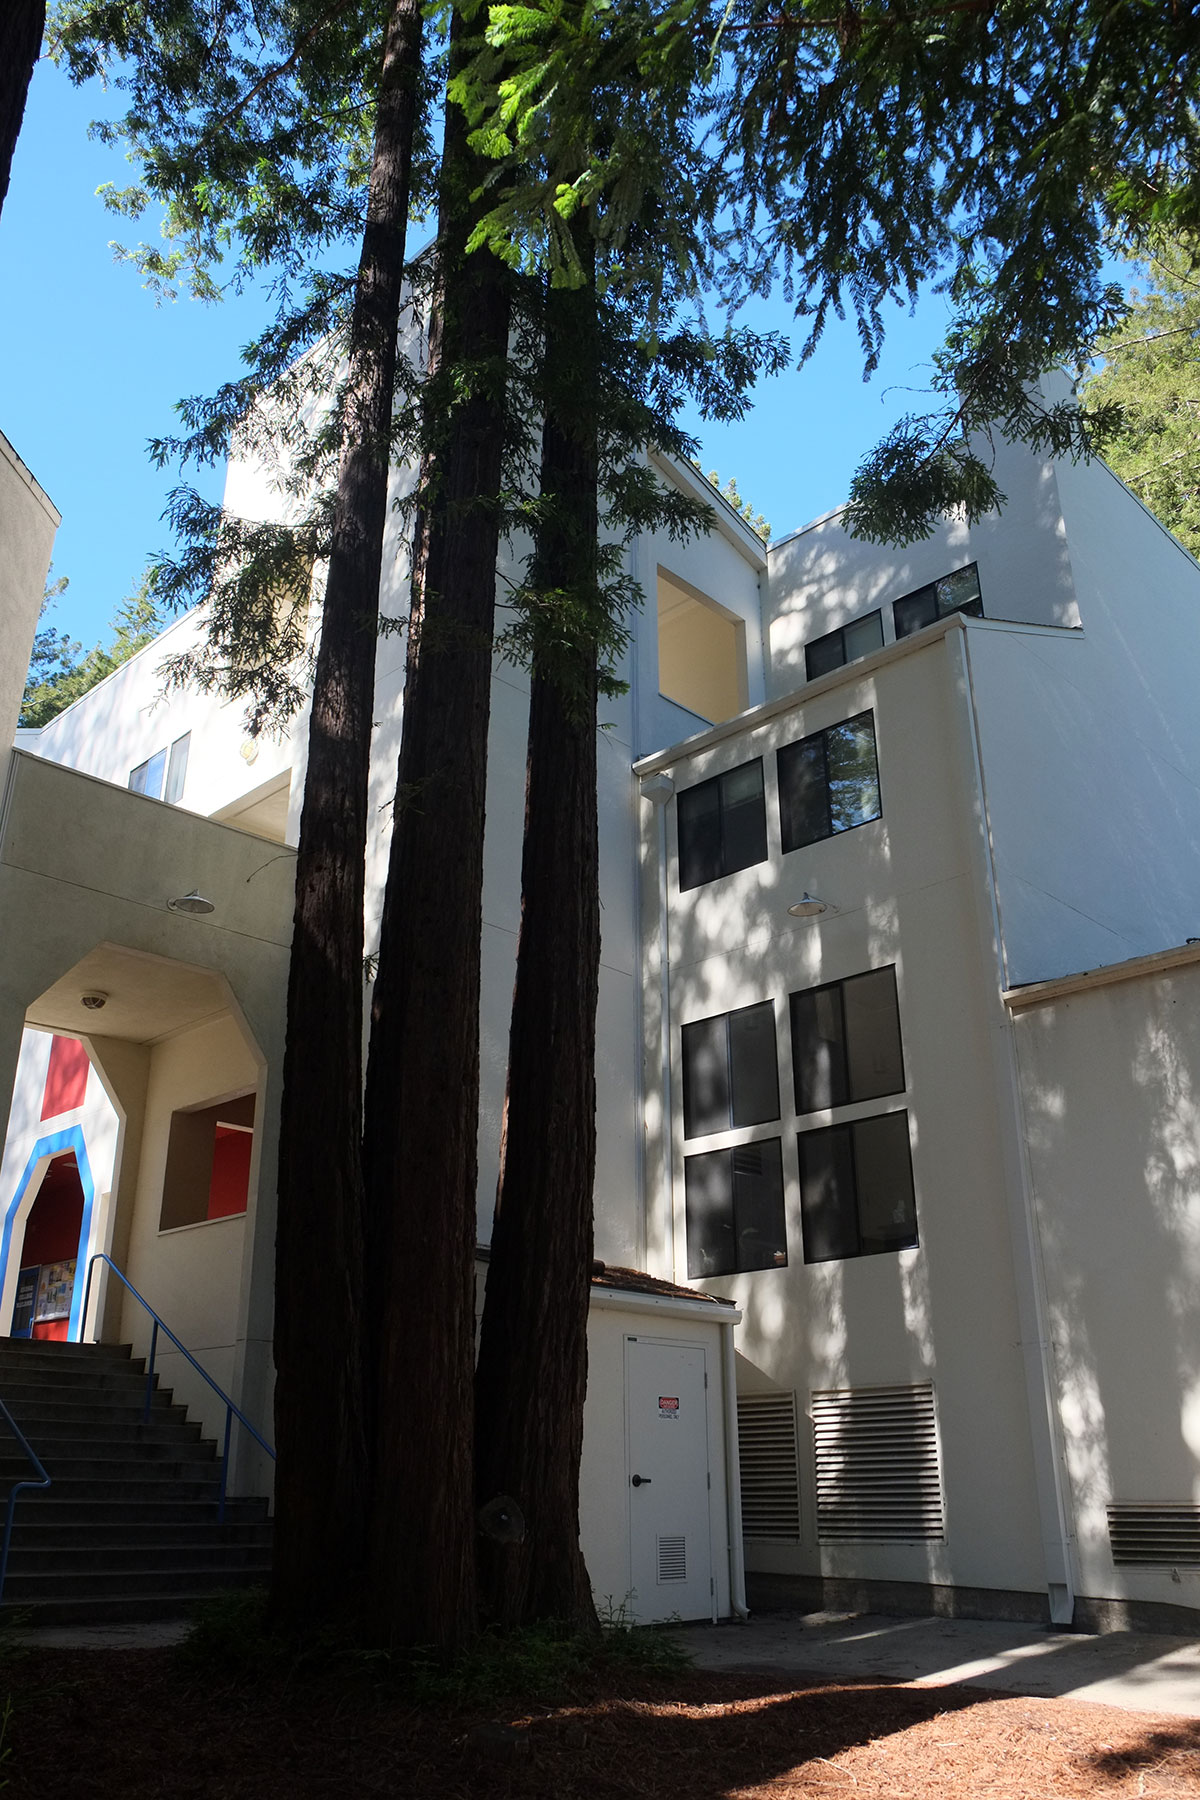 Kresge College UC Santa Cruz Peregrine Nation - Google maps kresgie college us santa cruz